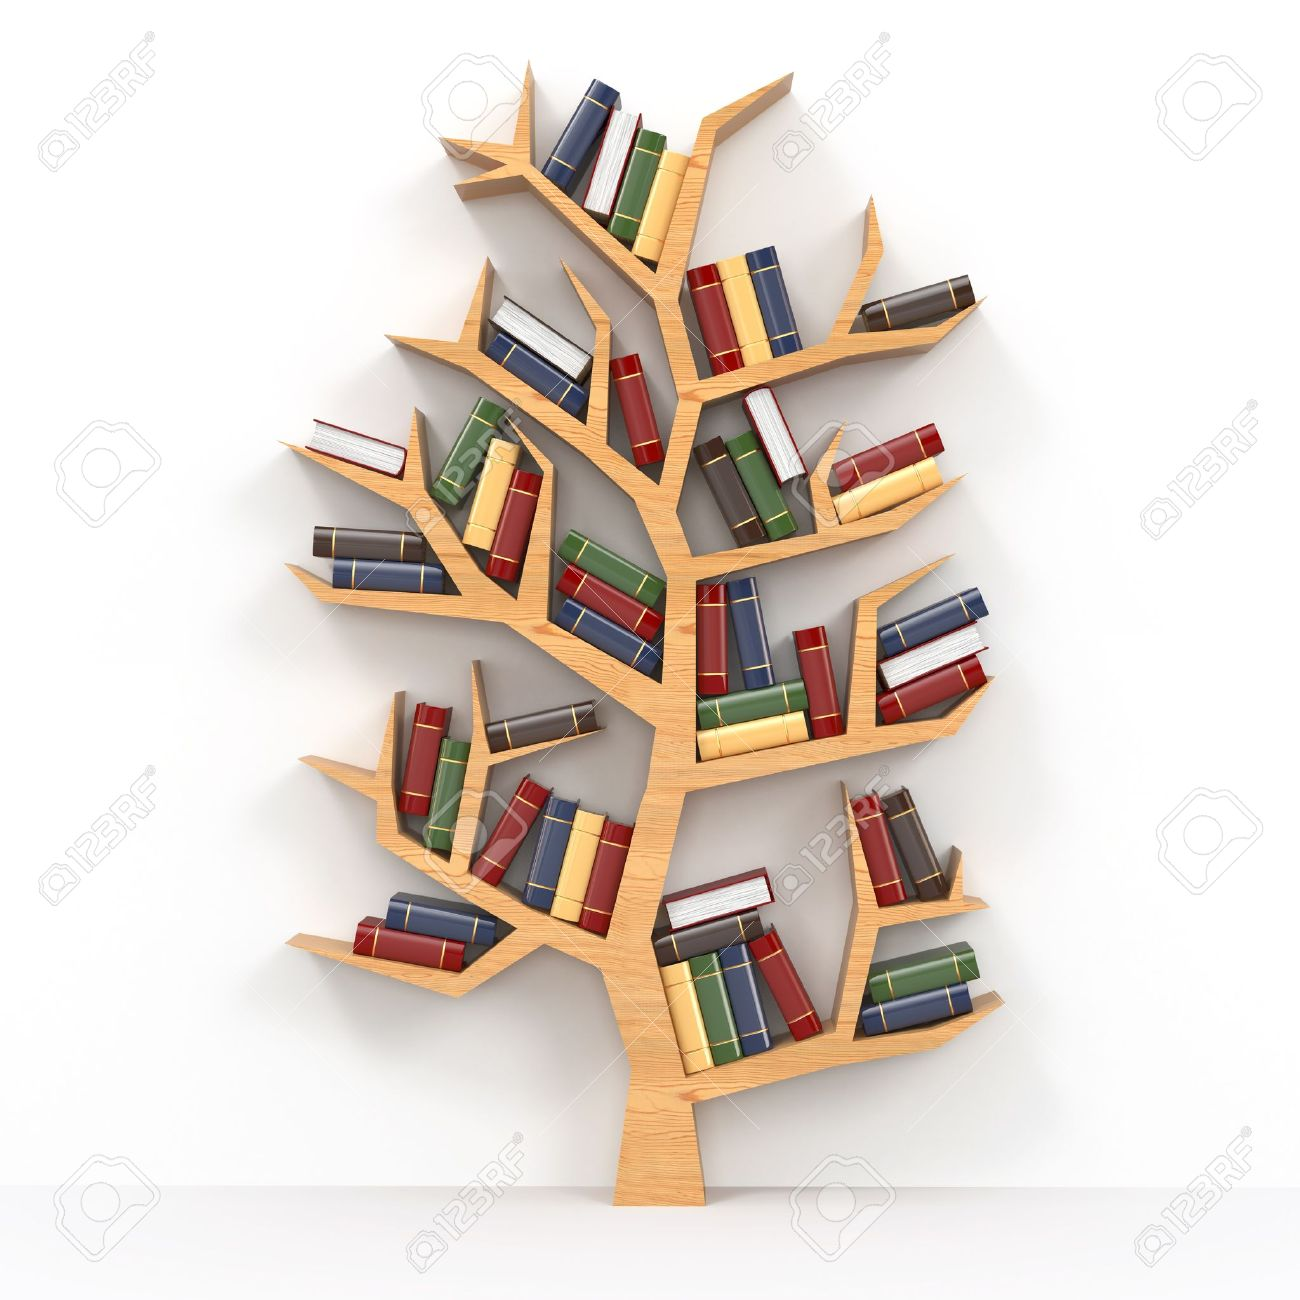 tree of knowledge bookshelf on white background d stock photo  - tree of knowledge bookshelf on white background d stock photo